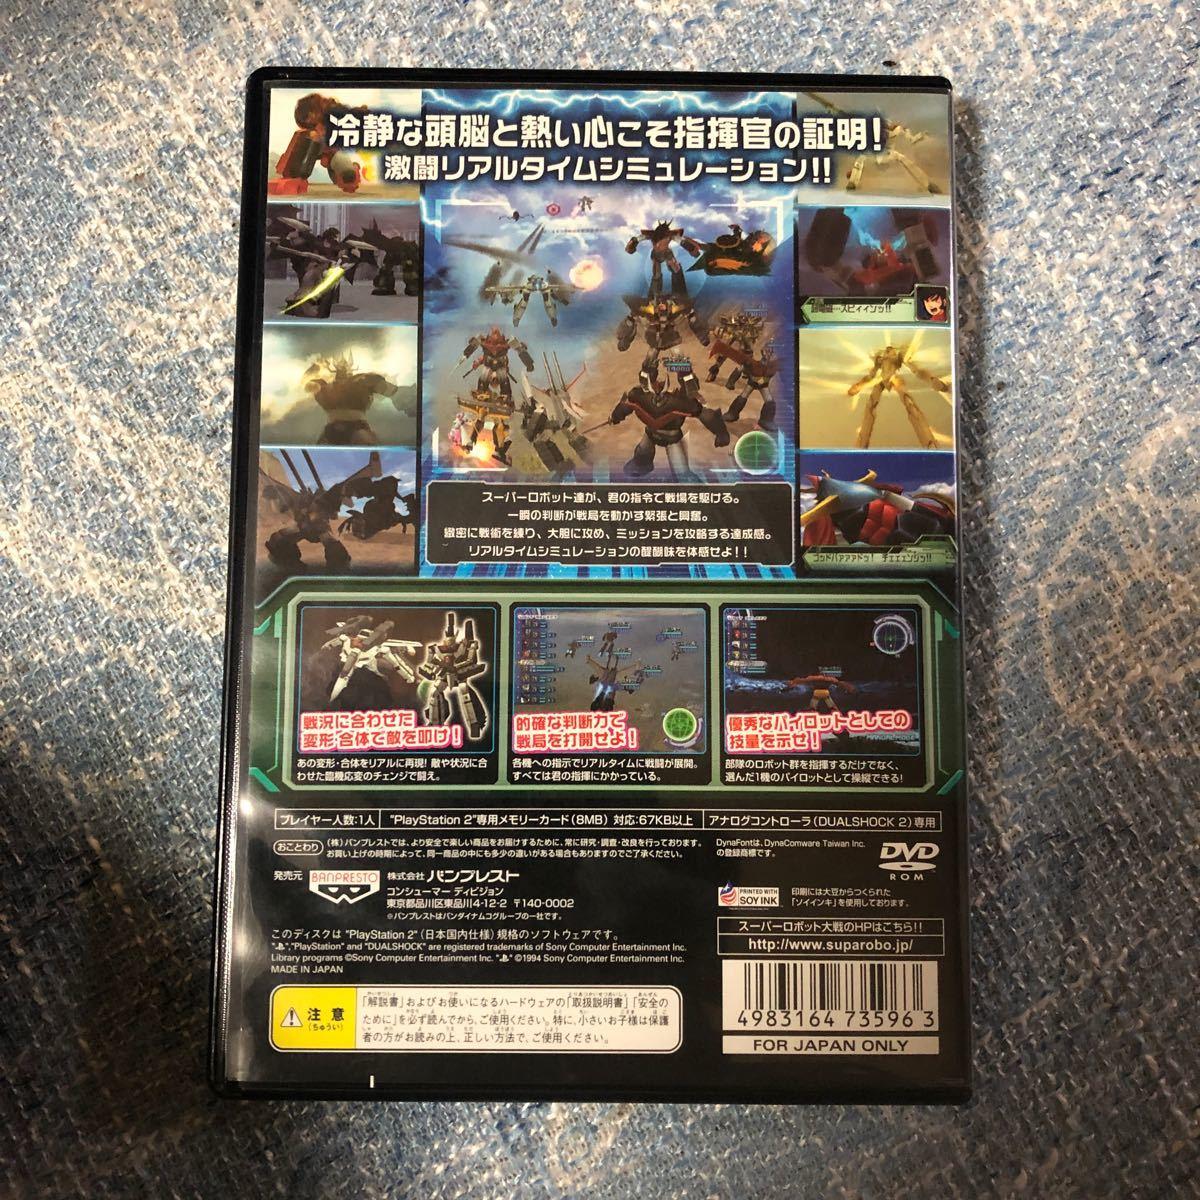 PS2スーパーロボット大戦 Scramble Commander the 2nd